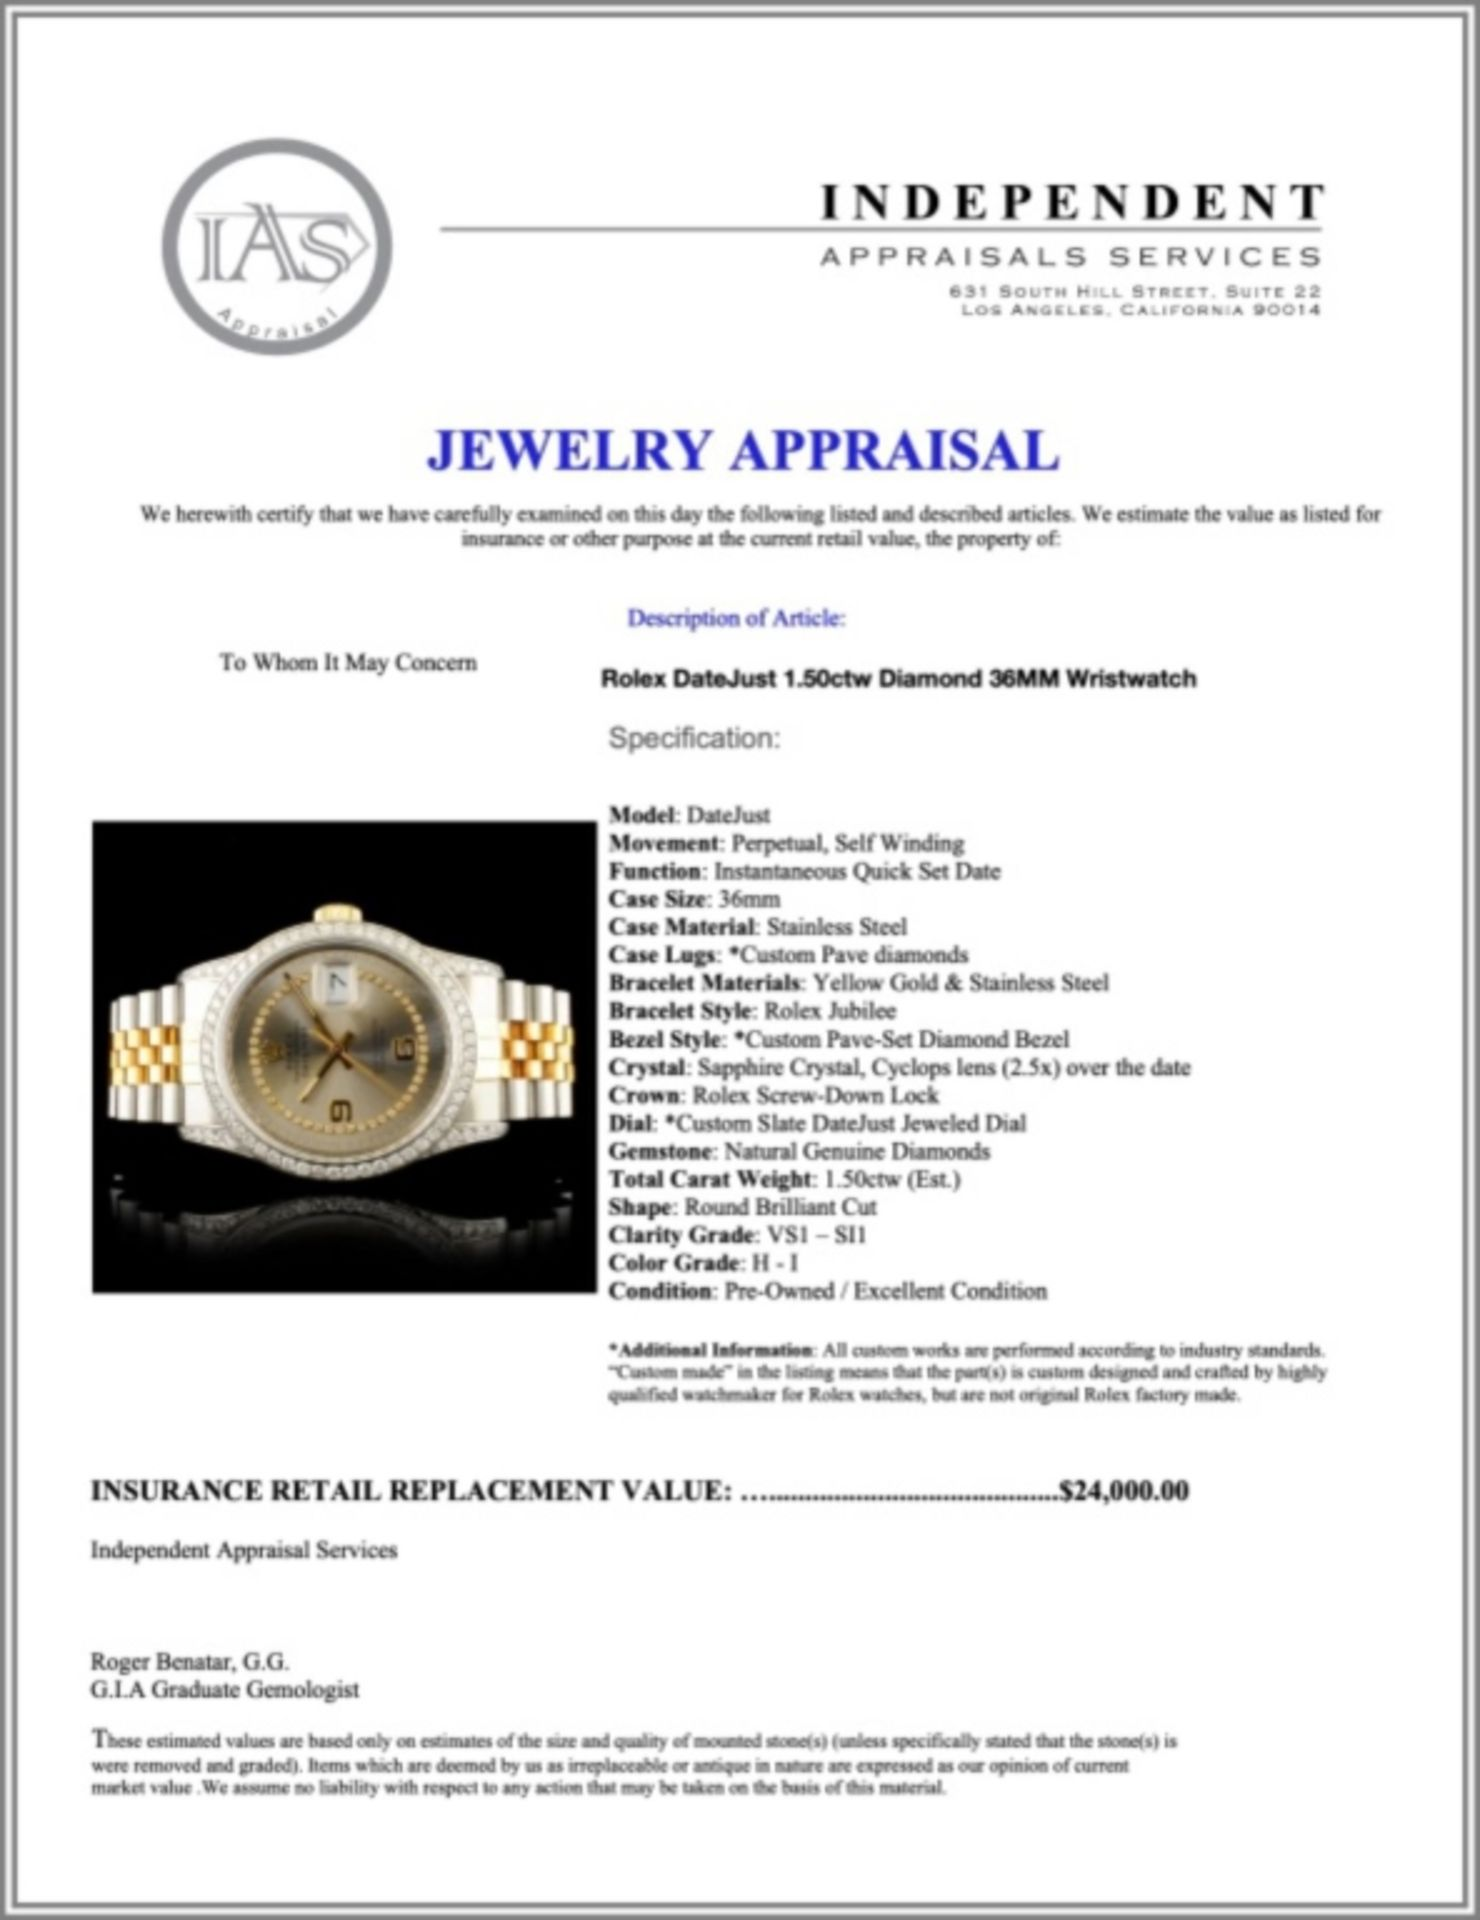 Rolex DateJust 1.50ctw Diamond 36MM Wristwatch - Image 6 of 6